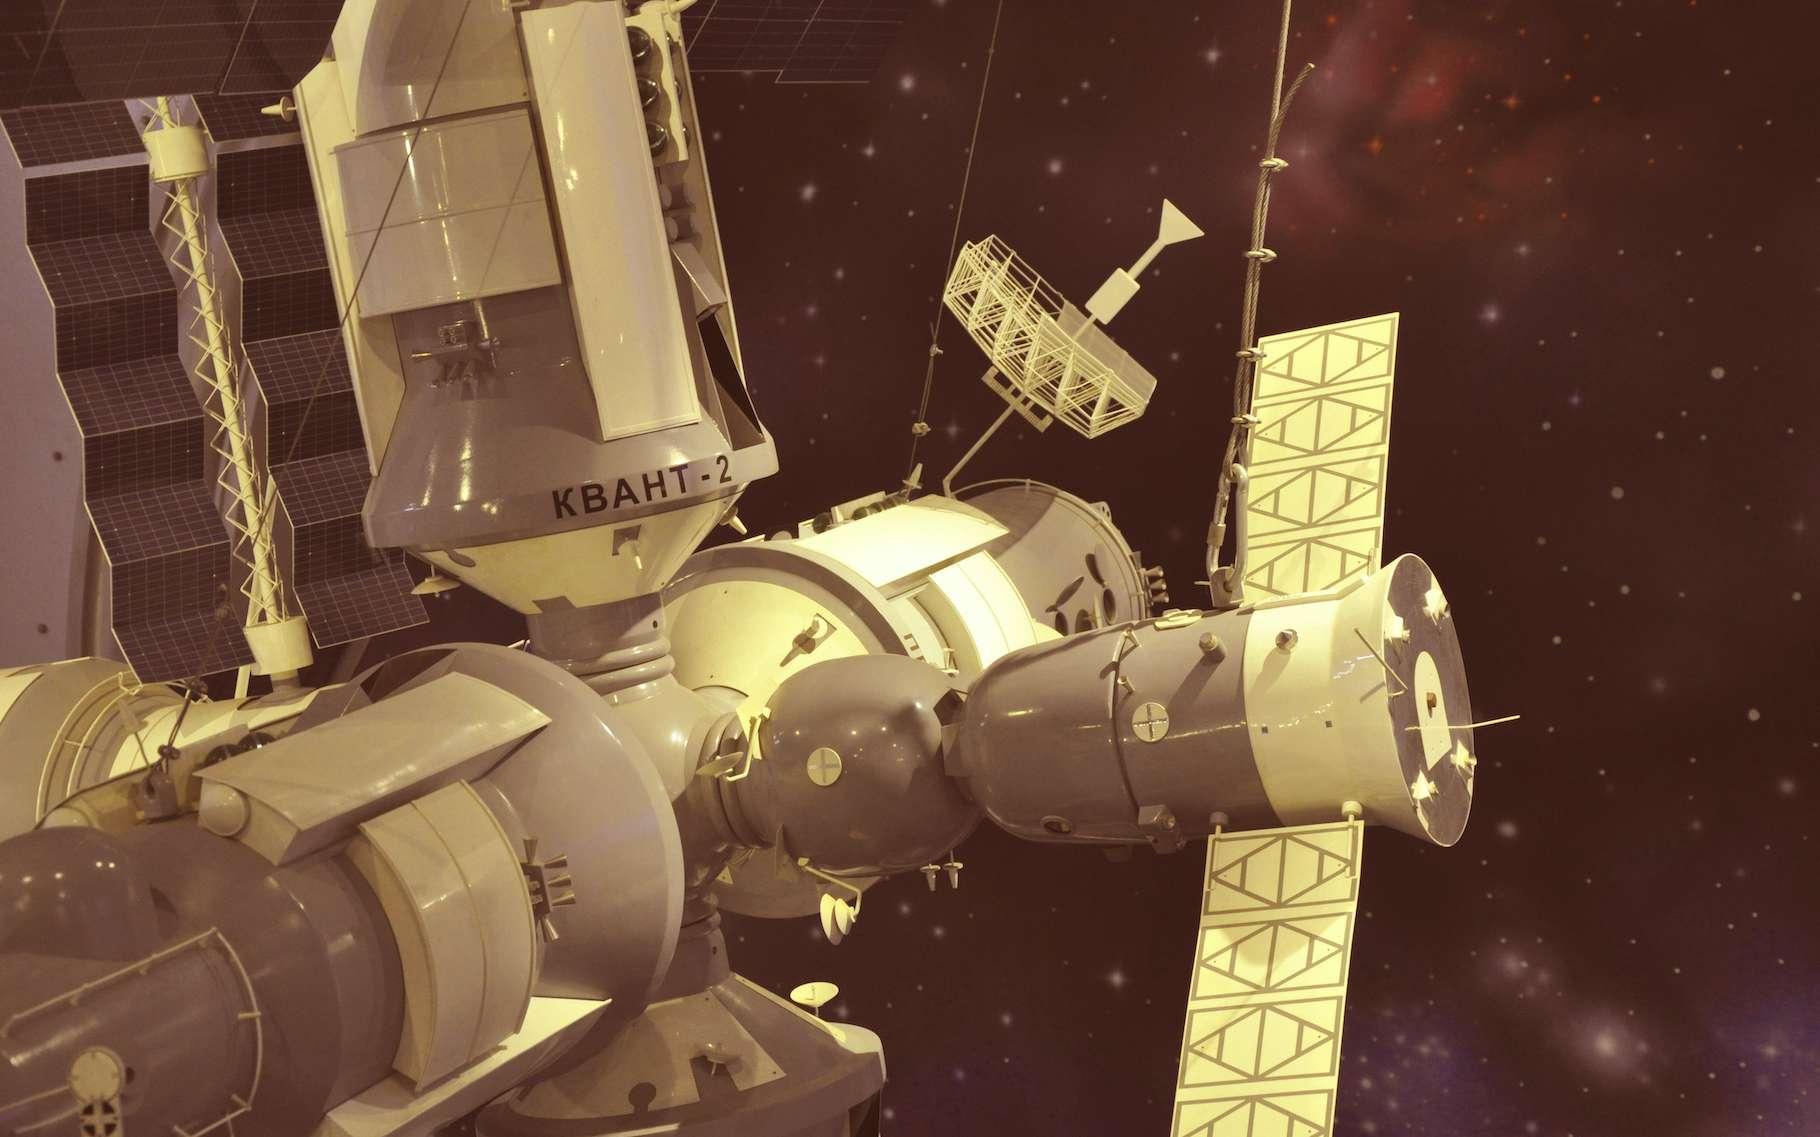 La station spatiale soviétique MIR a été désorbitée avec succès en mars 2001. © Александр Байдук, Adobe Stock